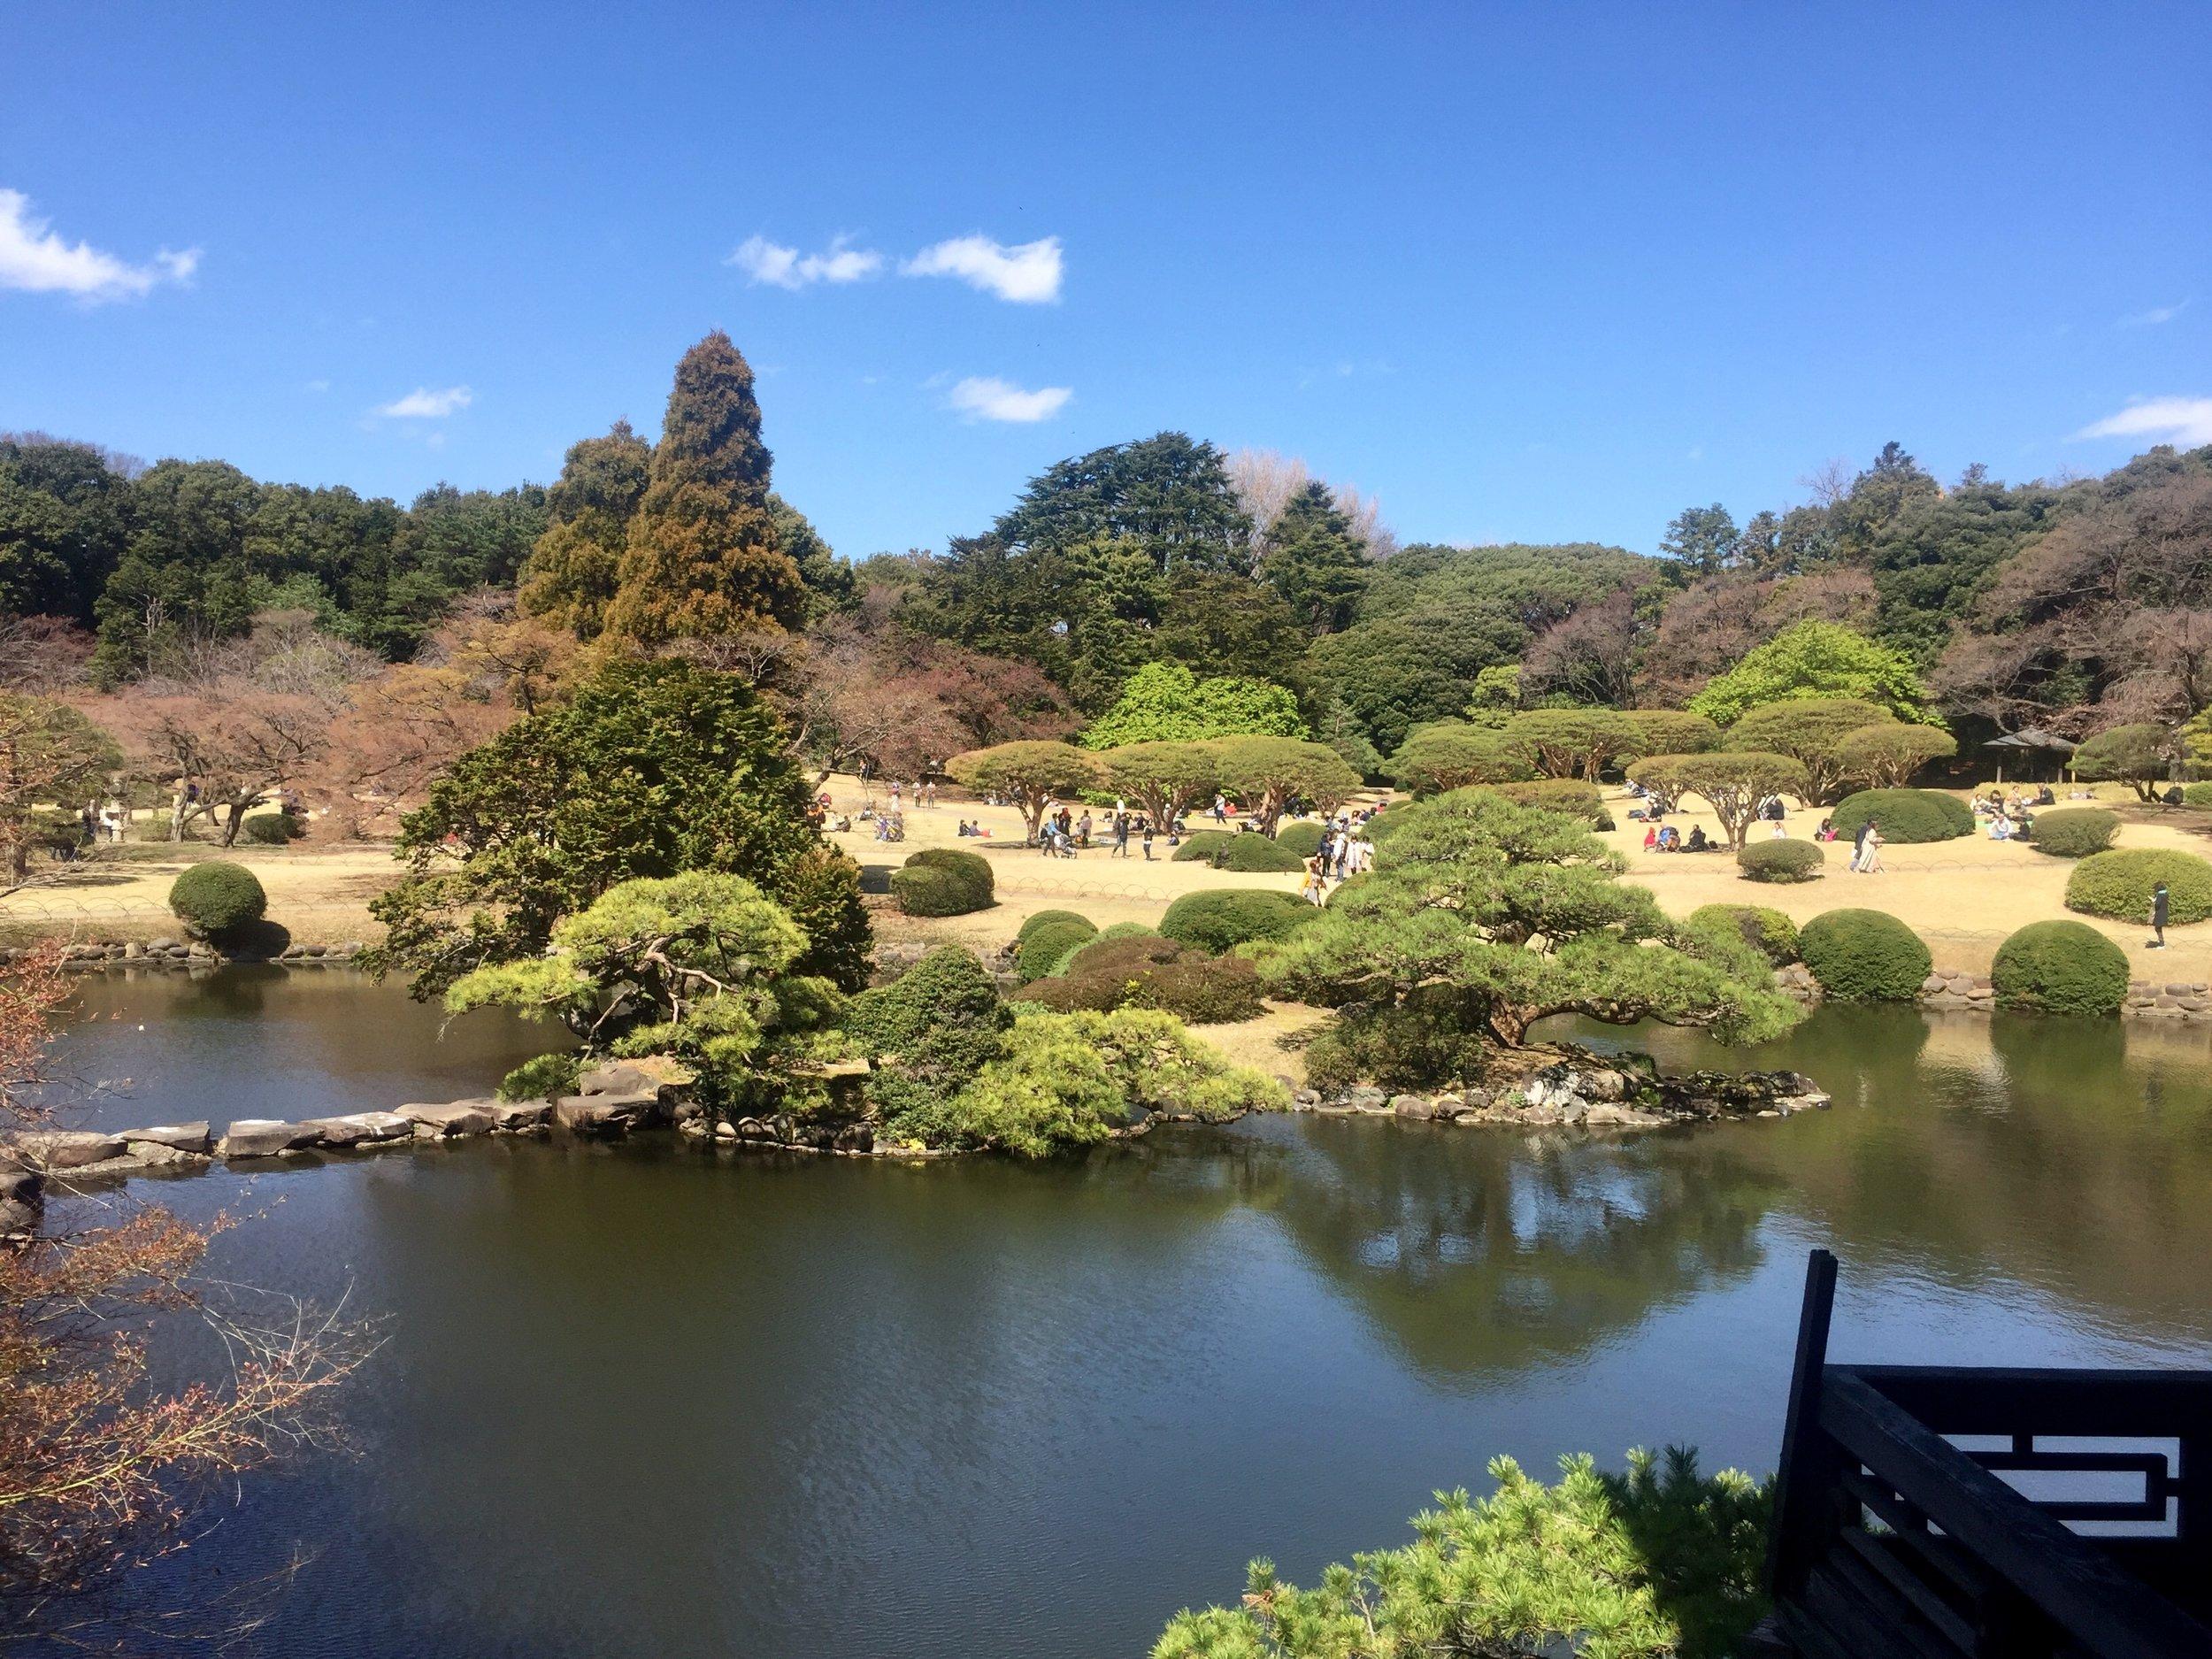 shinjuku gardens tokyo japan march 2019.jpg